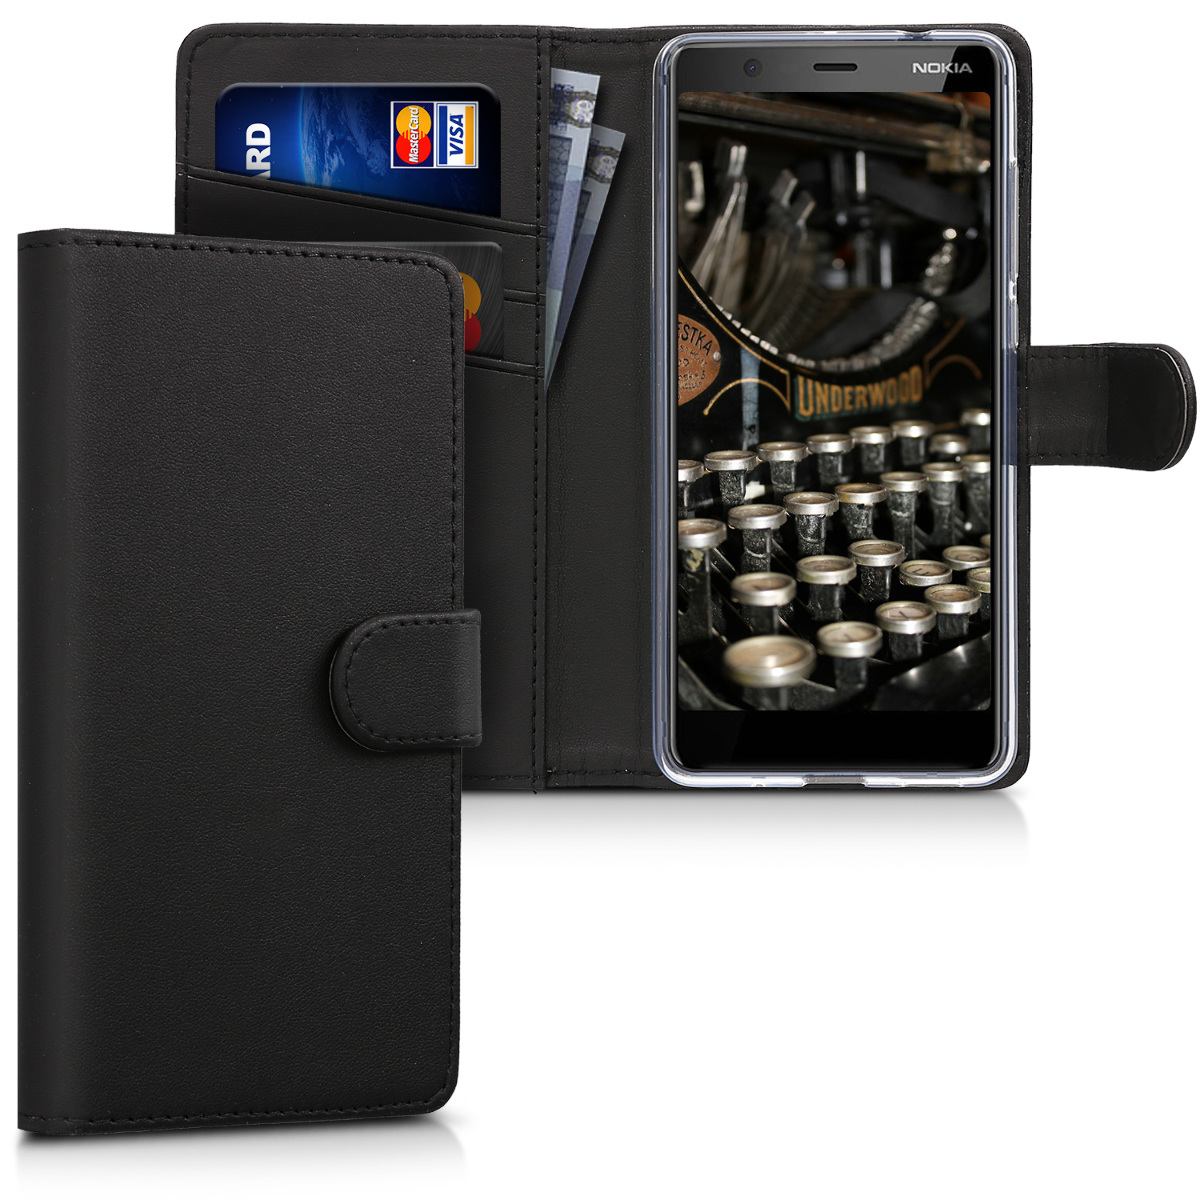 KW Θήκη - Πορτοφόλι Nokia 5.1 2018 - Black (45406.01)